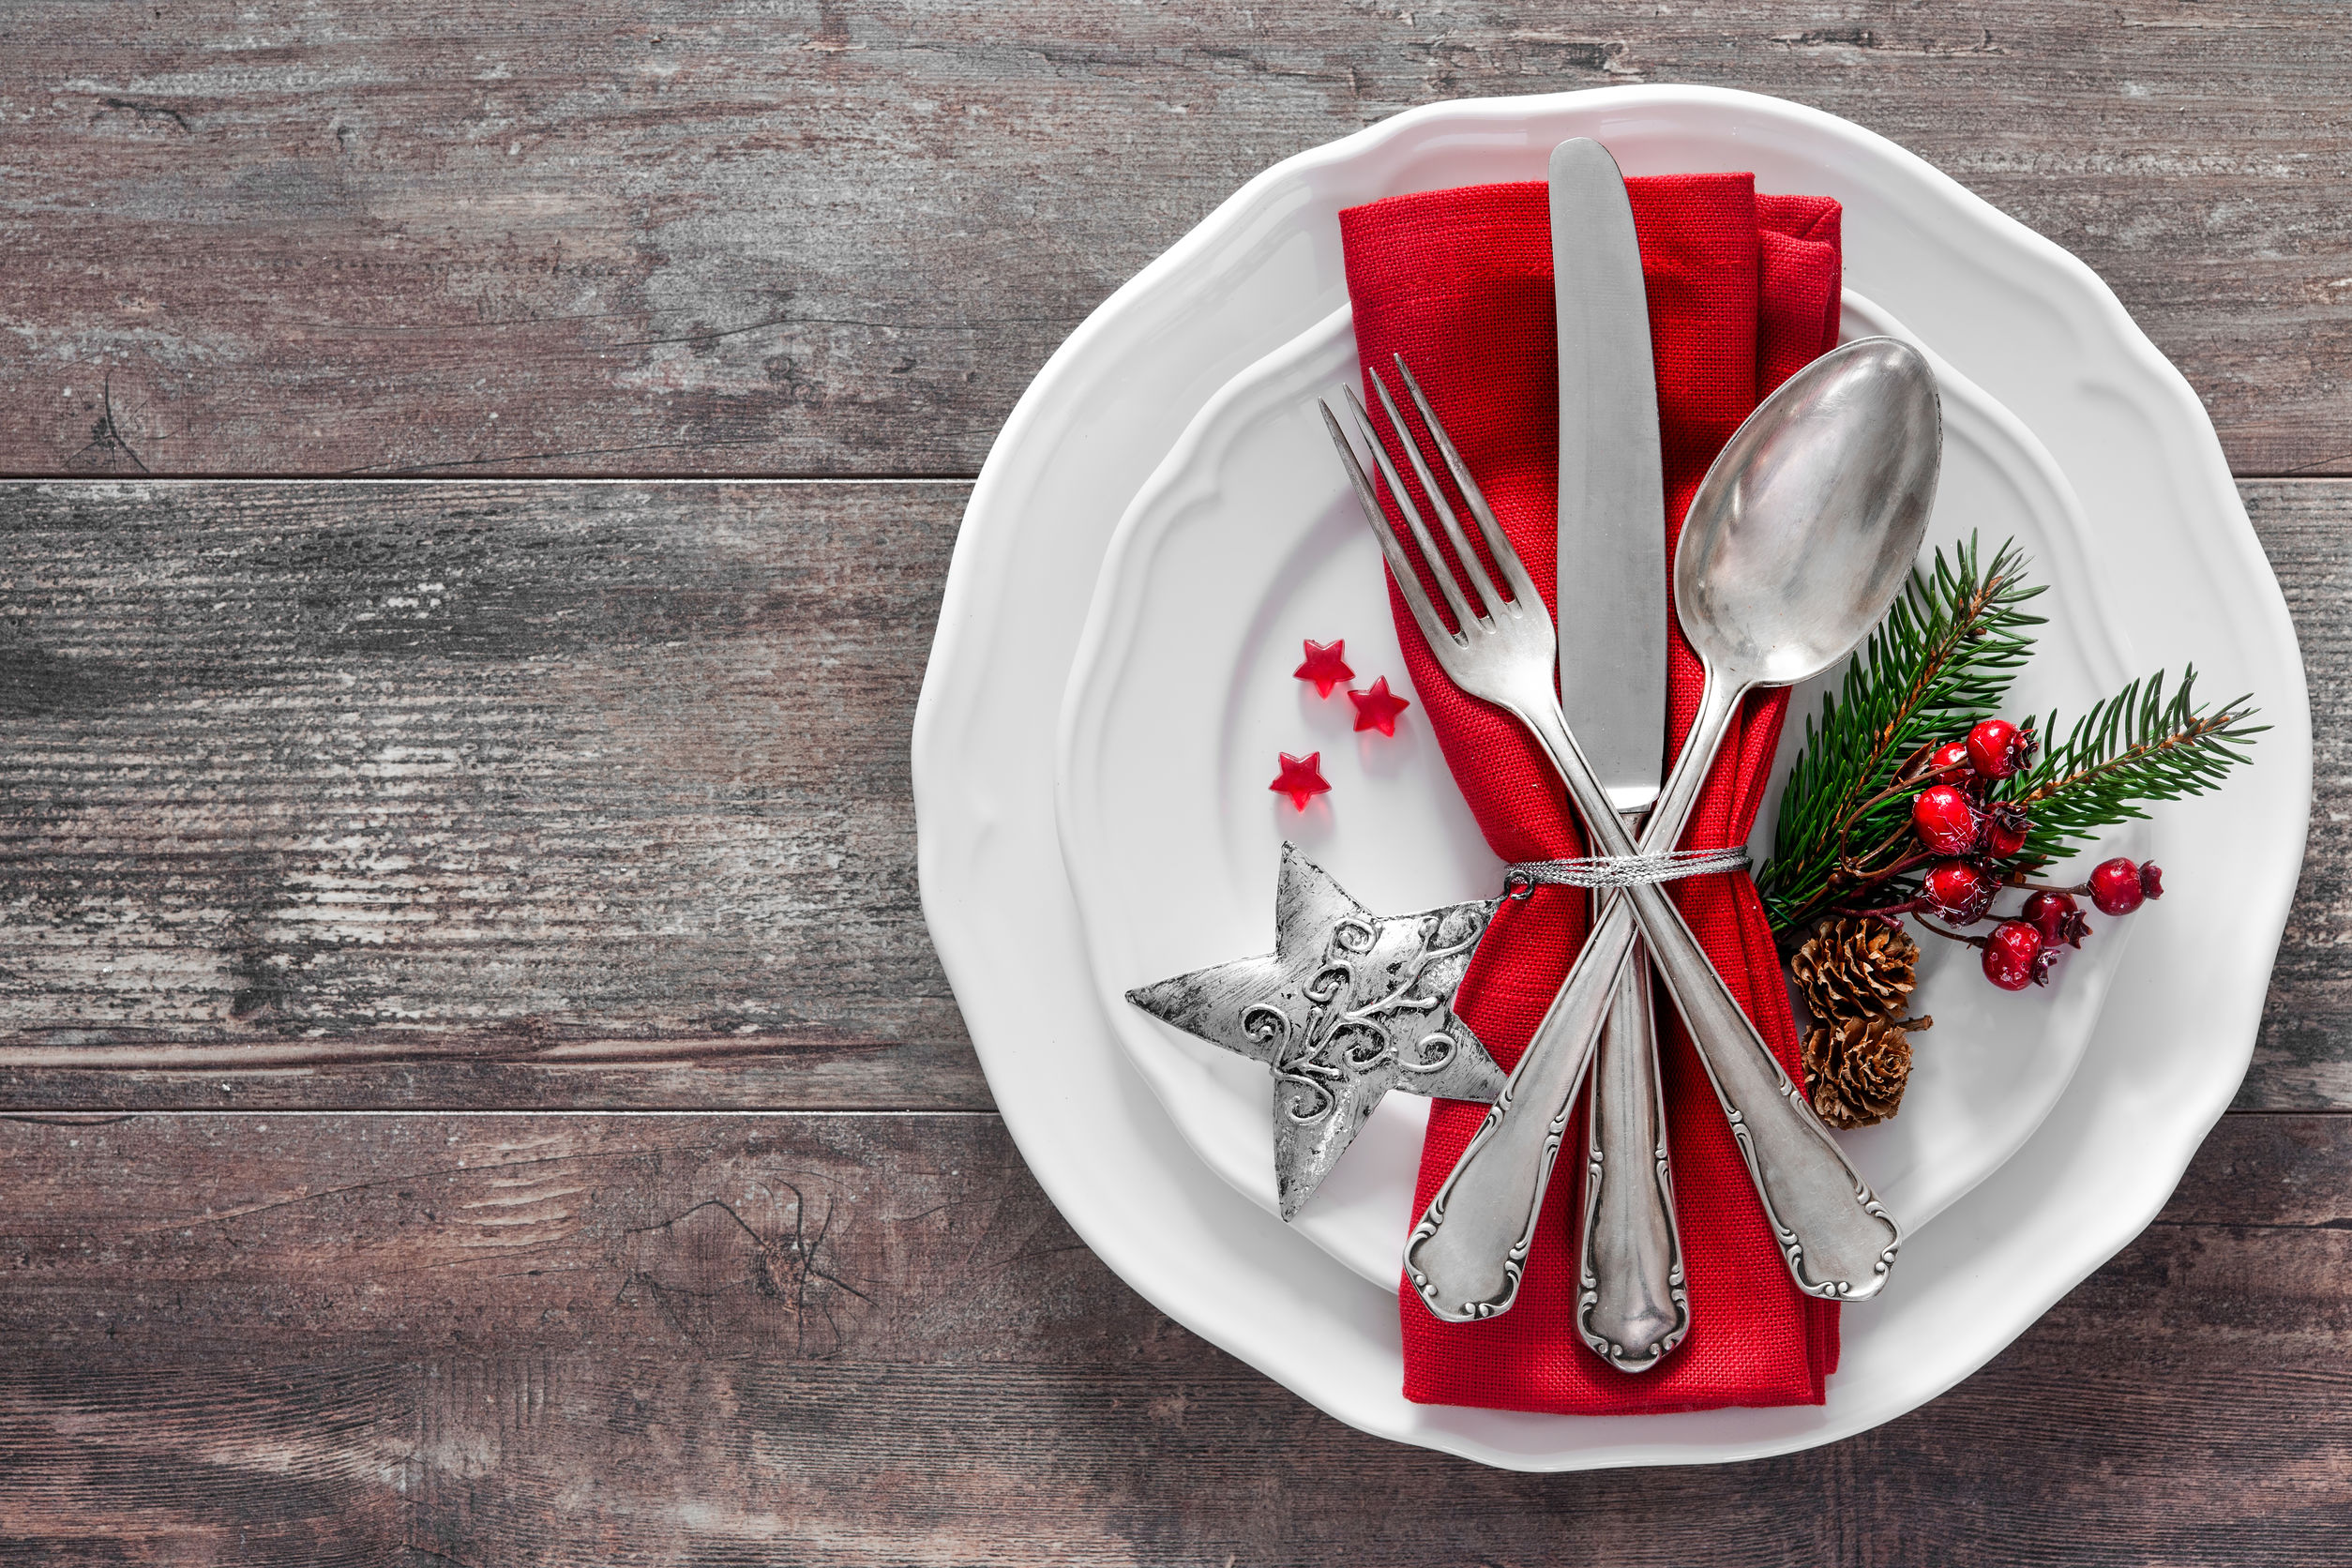 Christmas Dinner for Two